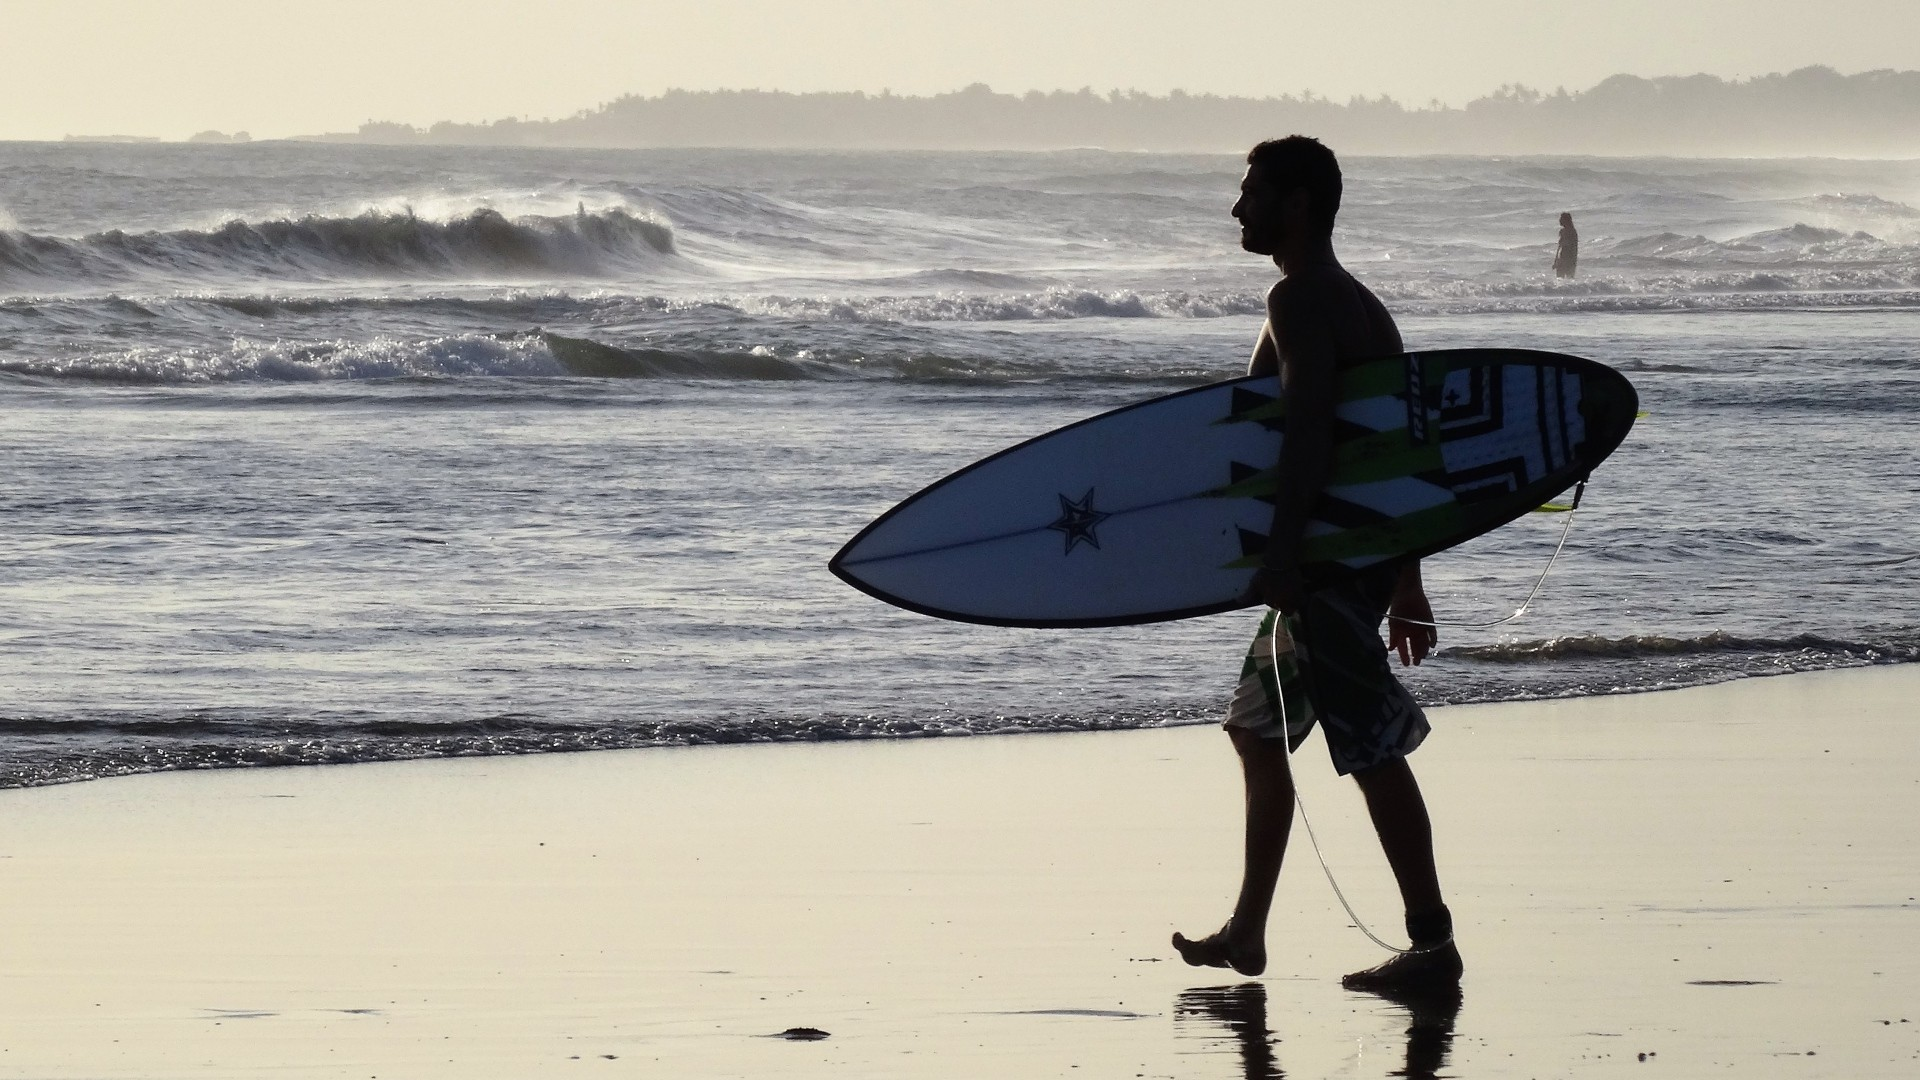 Wallpaper surfer, bali, beach, surfing